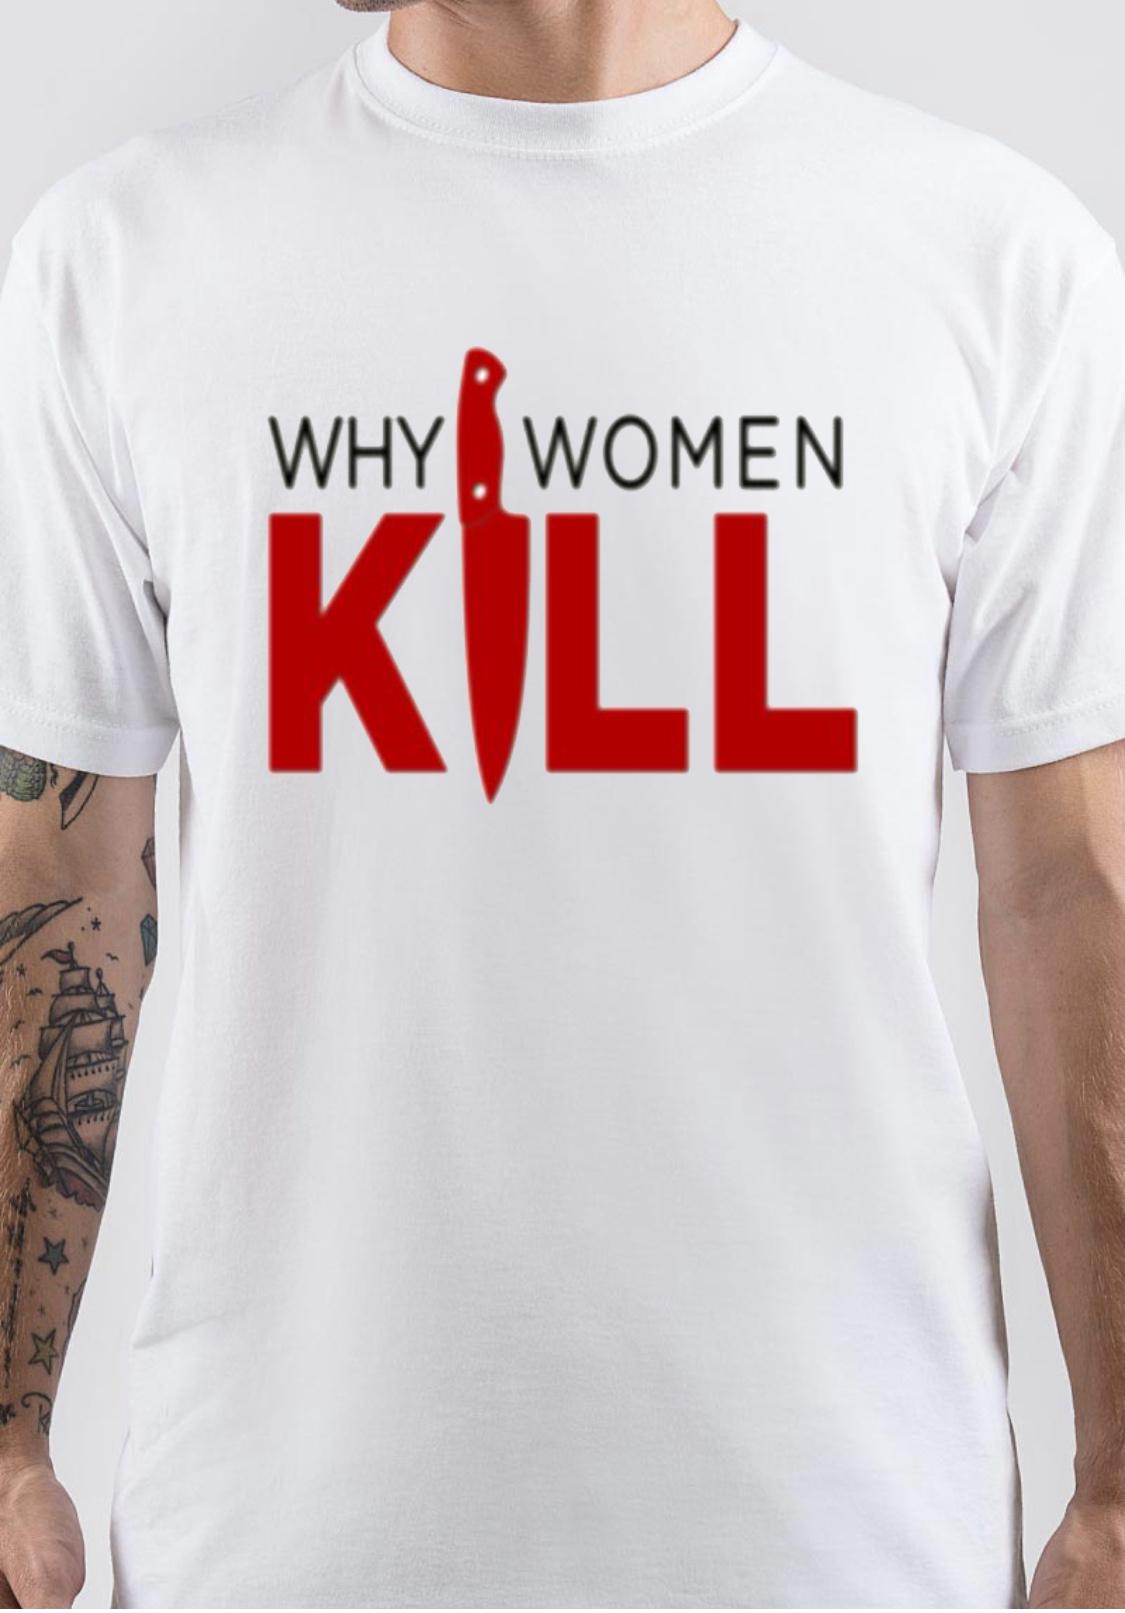 Why Women Kill T-Shirt And Merchandise